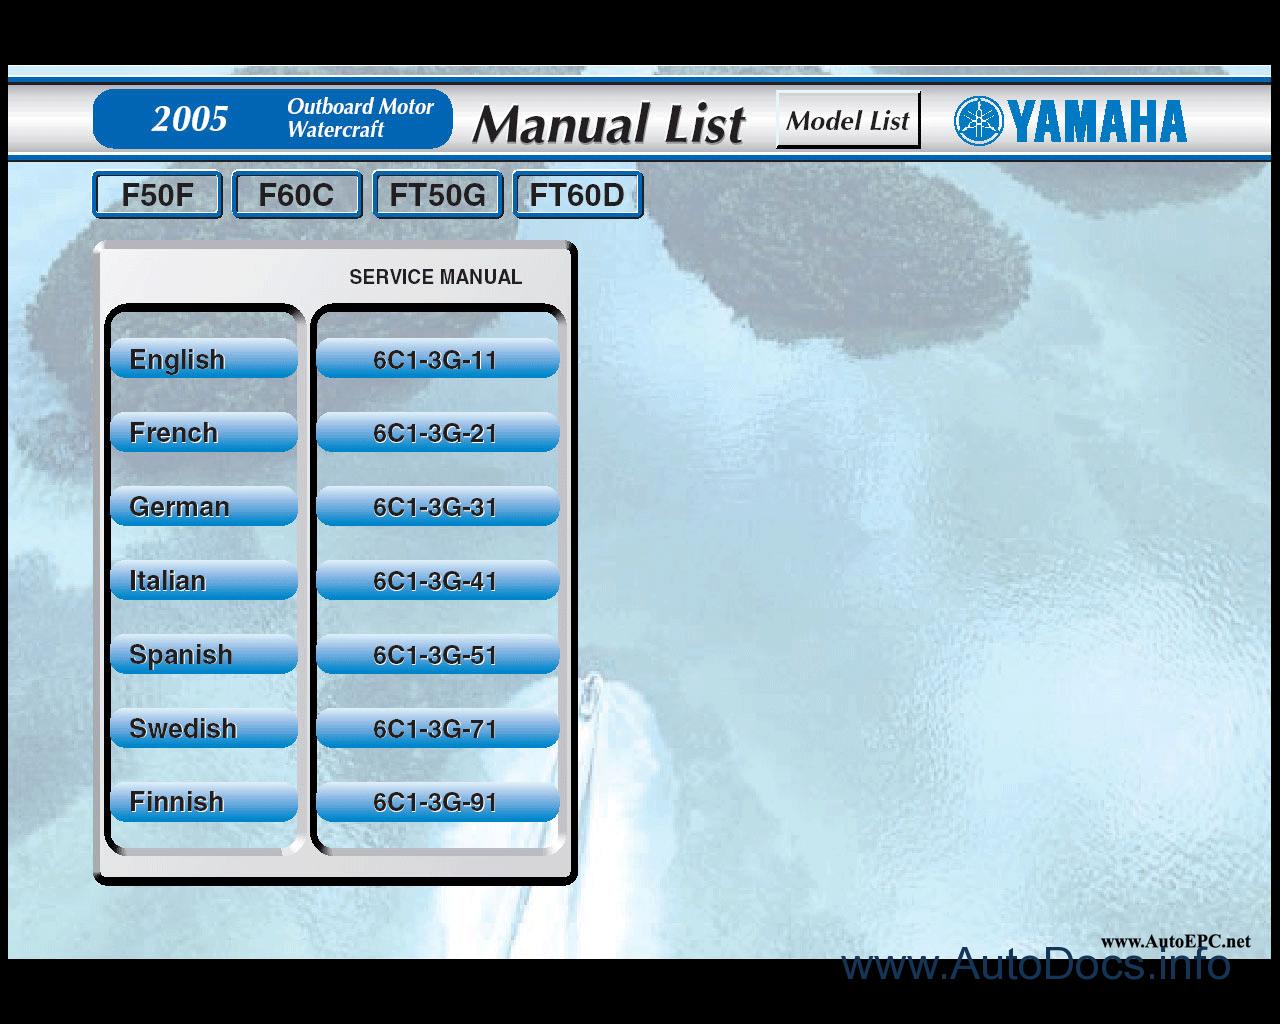 yamaha outboard motors watercraft jetski repair manual. Black Bedroom Furniture Sets. Home Design Ideas